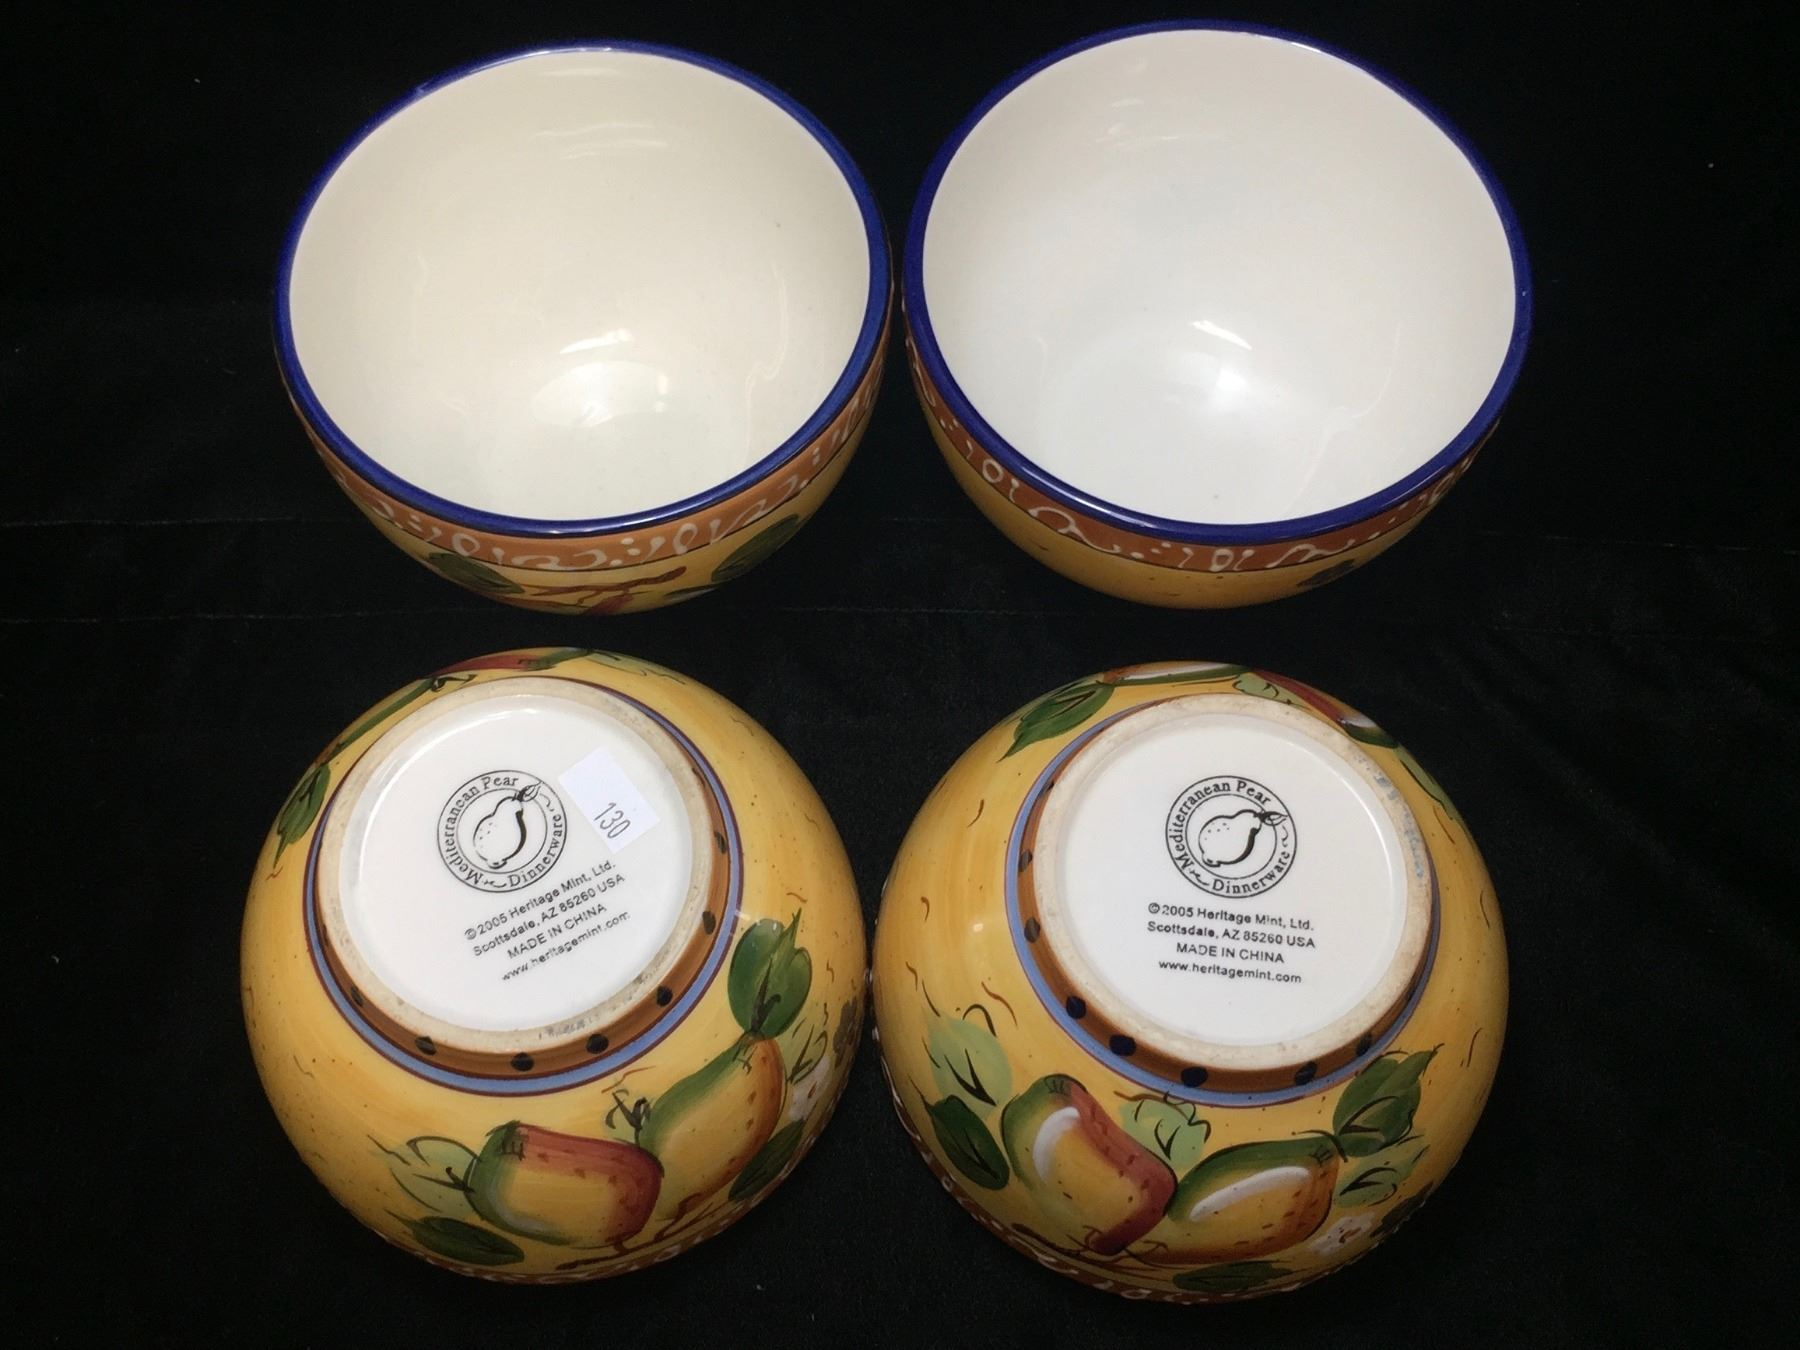 Lot of 4 - Heritage Mint Ltd  'Mediterranean Pear' Cereal Bowls